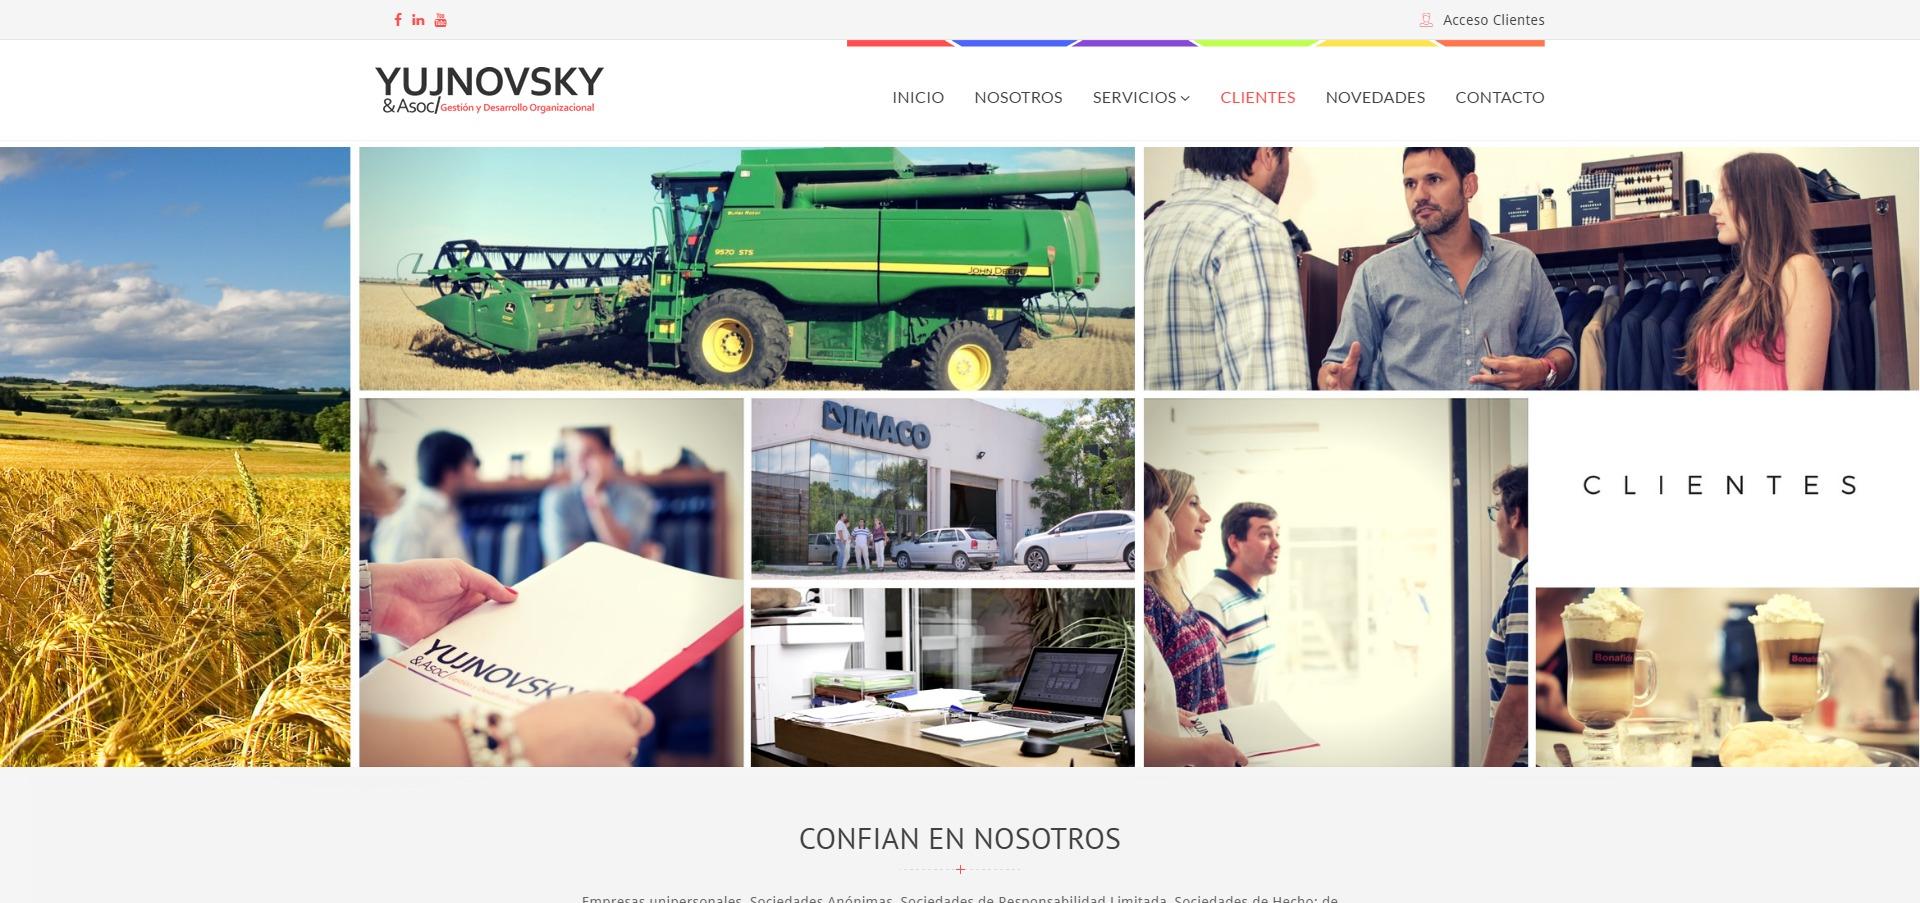 www.yujnovsky.com.ar